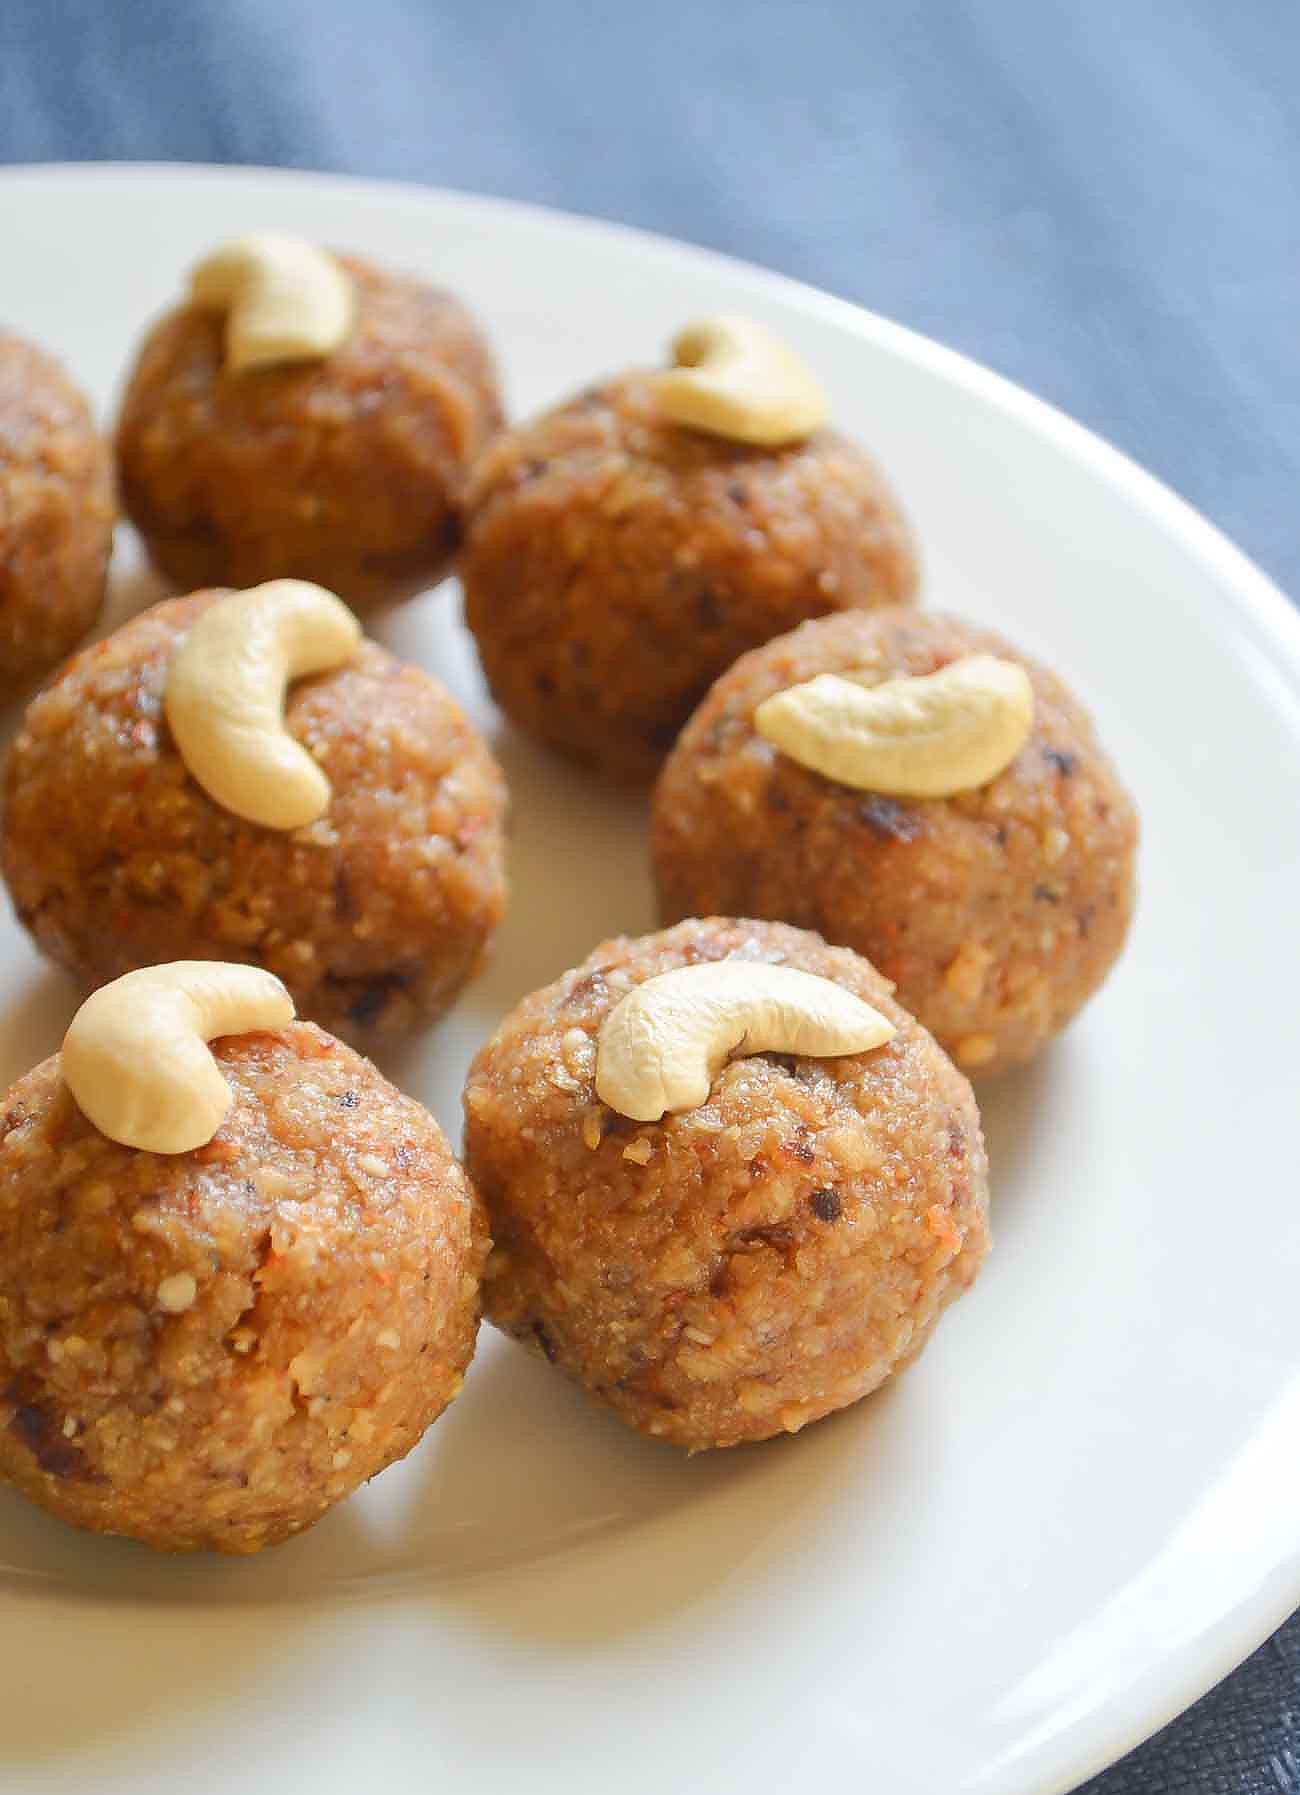 Malida recipe healthy whole wheat afghan sweet by archanas kitchen malida recipe healthy whole wheat afghan sweet forumfinder Choice Image